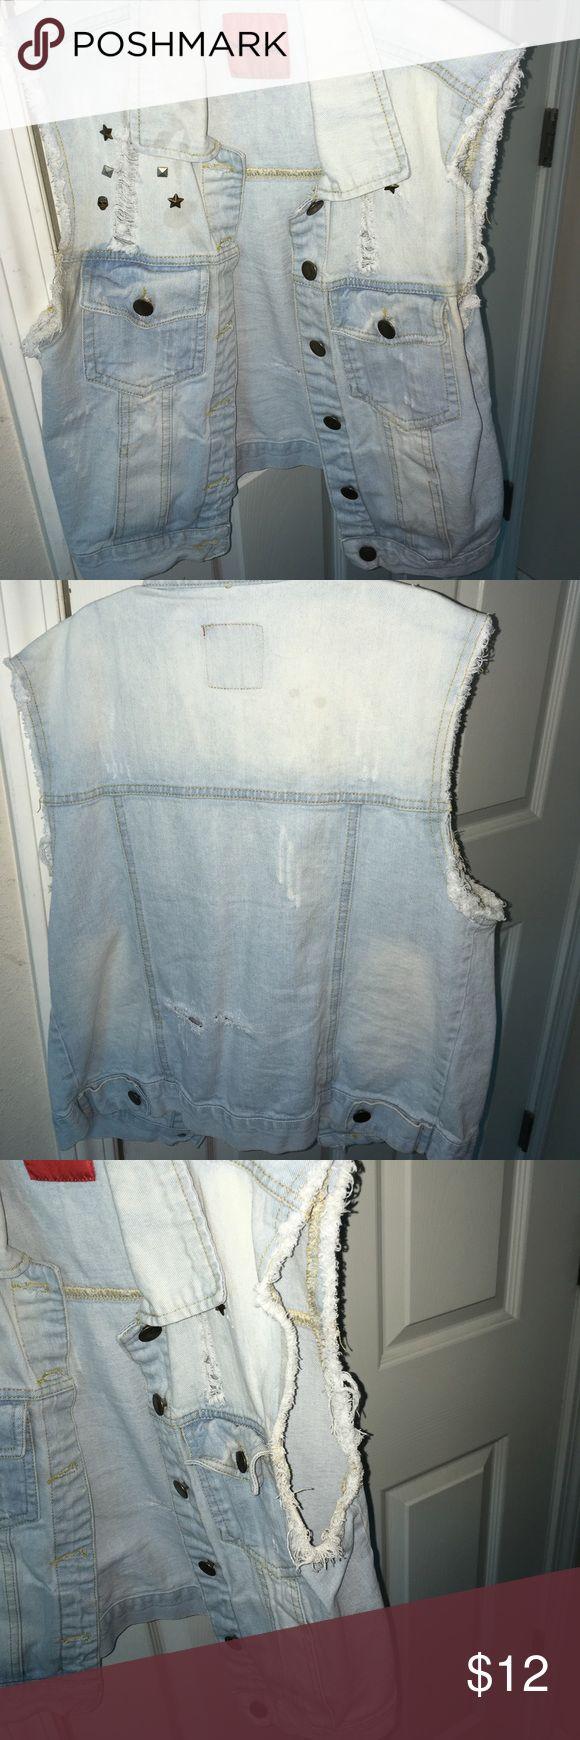 Short sleeve jean Jacket •White/Light blue Short Sleeve Jean Jacket. •Ripped designs on front and back. •Ripped designs on sleeve. •Size Small Jackets & Coats Jean Jackets